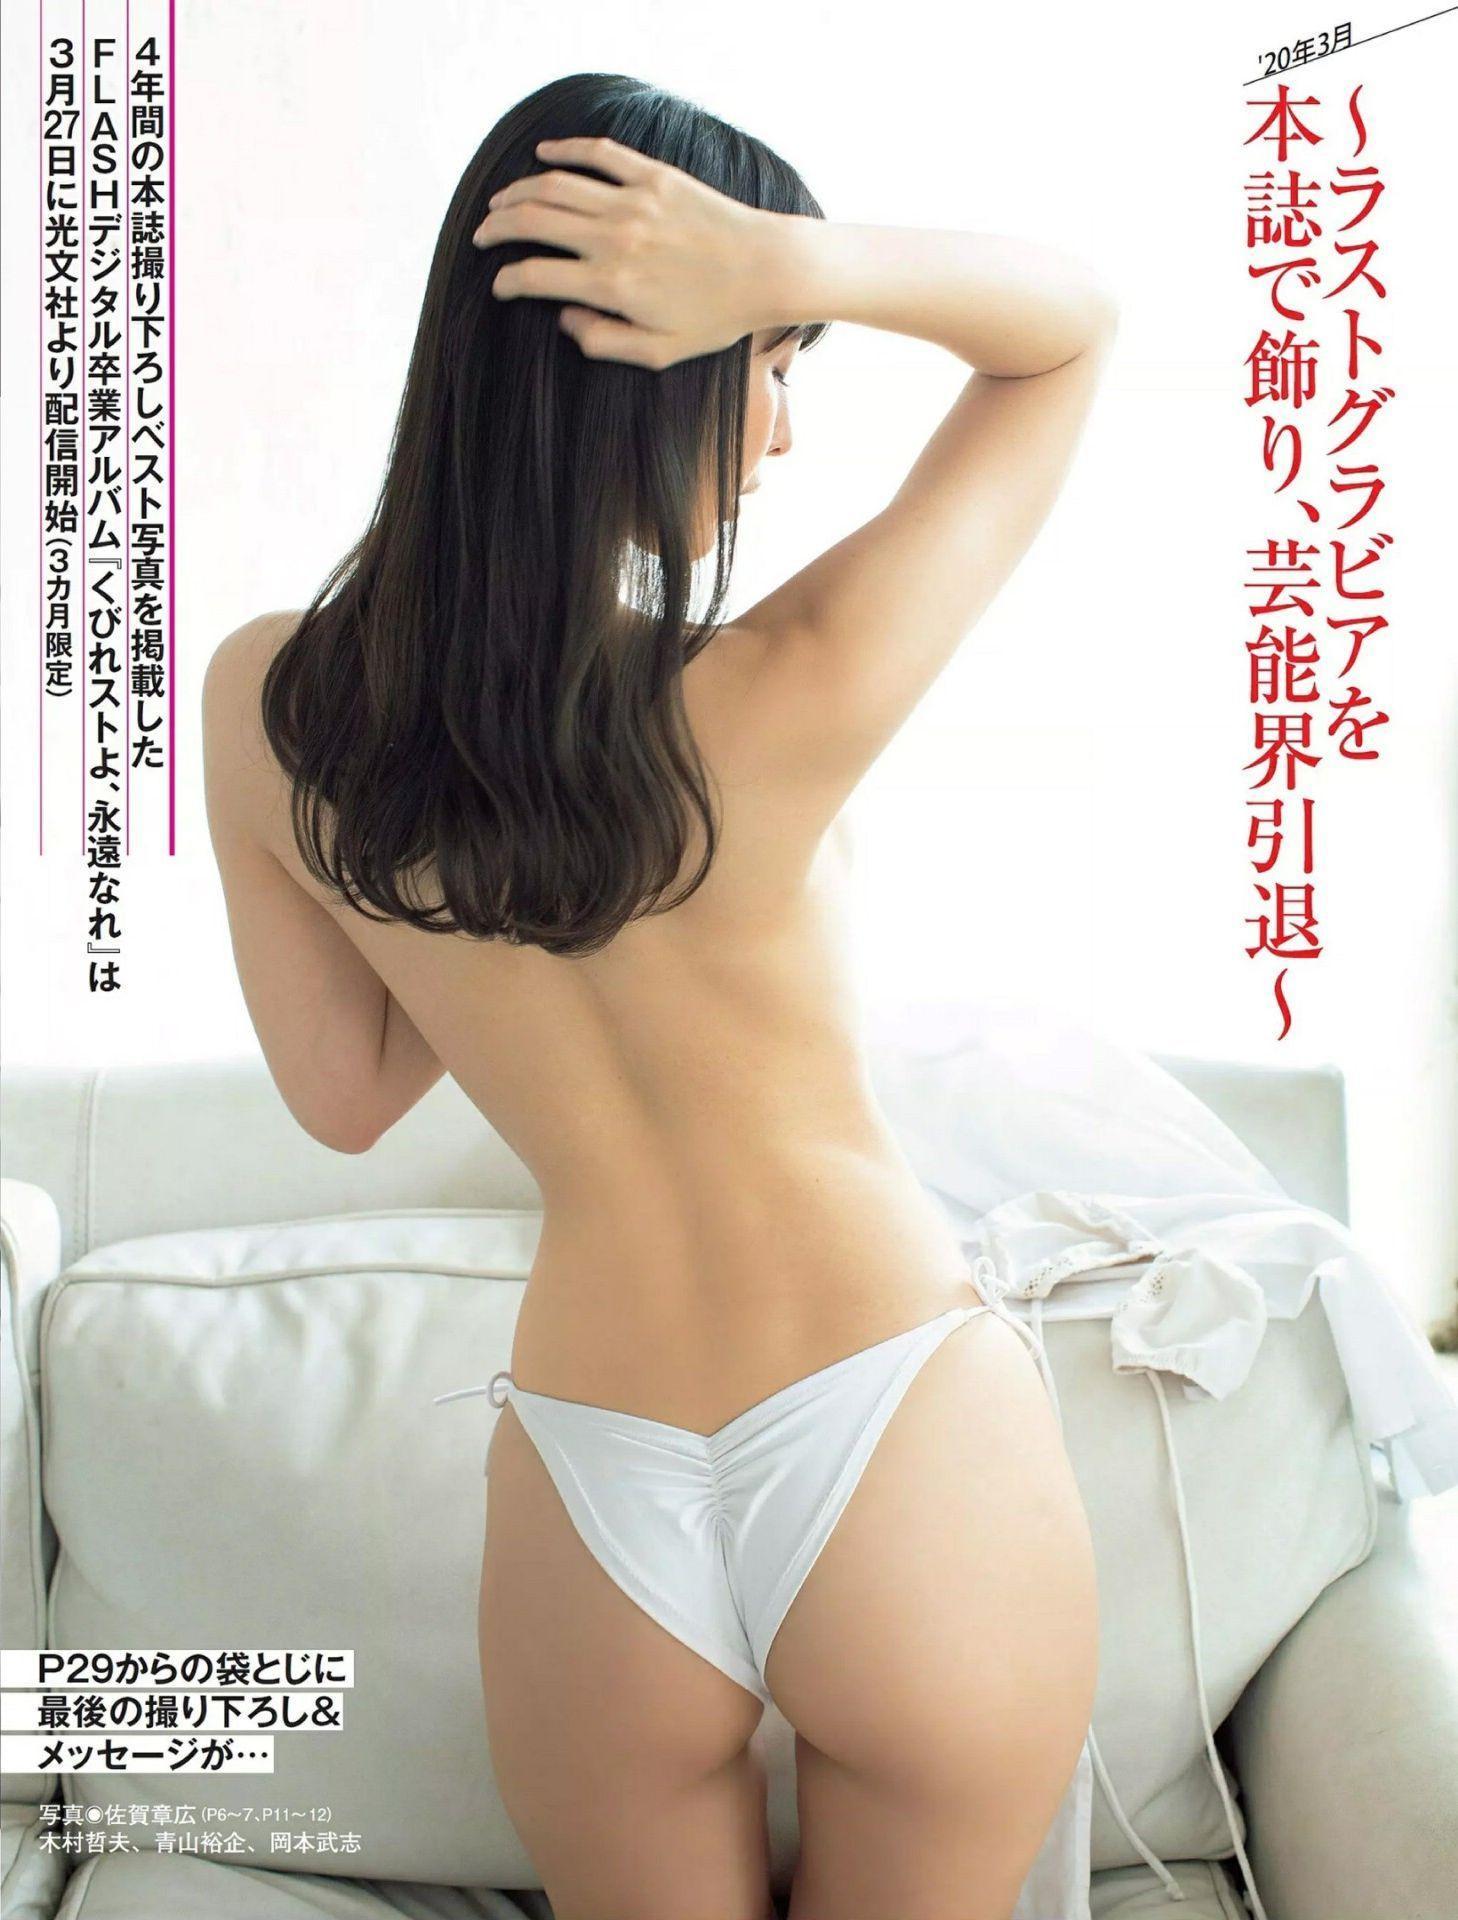 川崎绫 吉田莉樱 FLASH